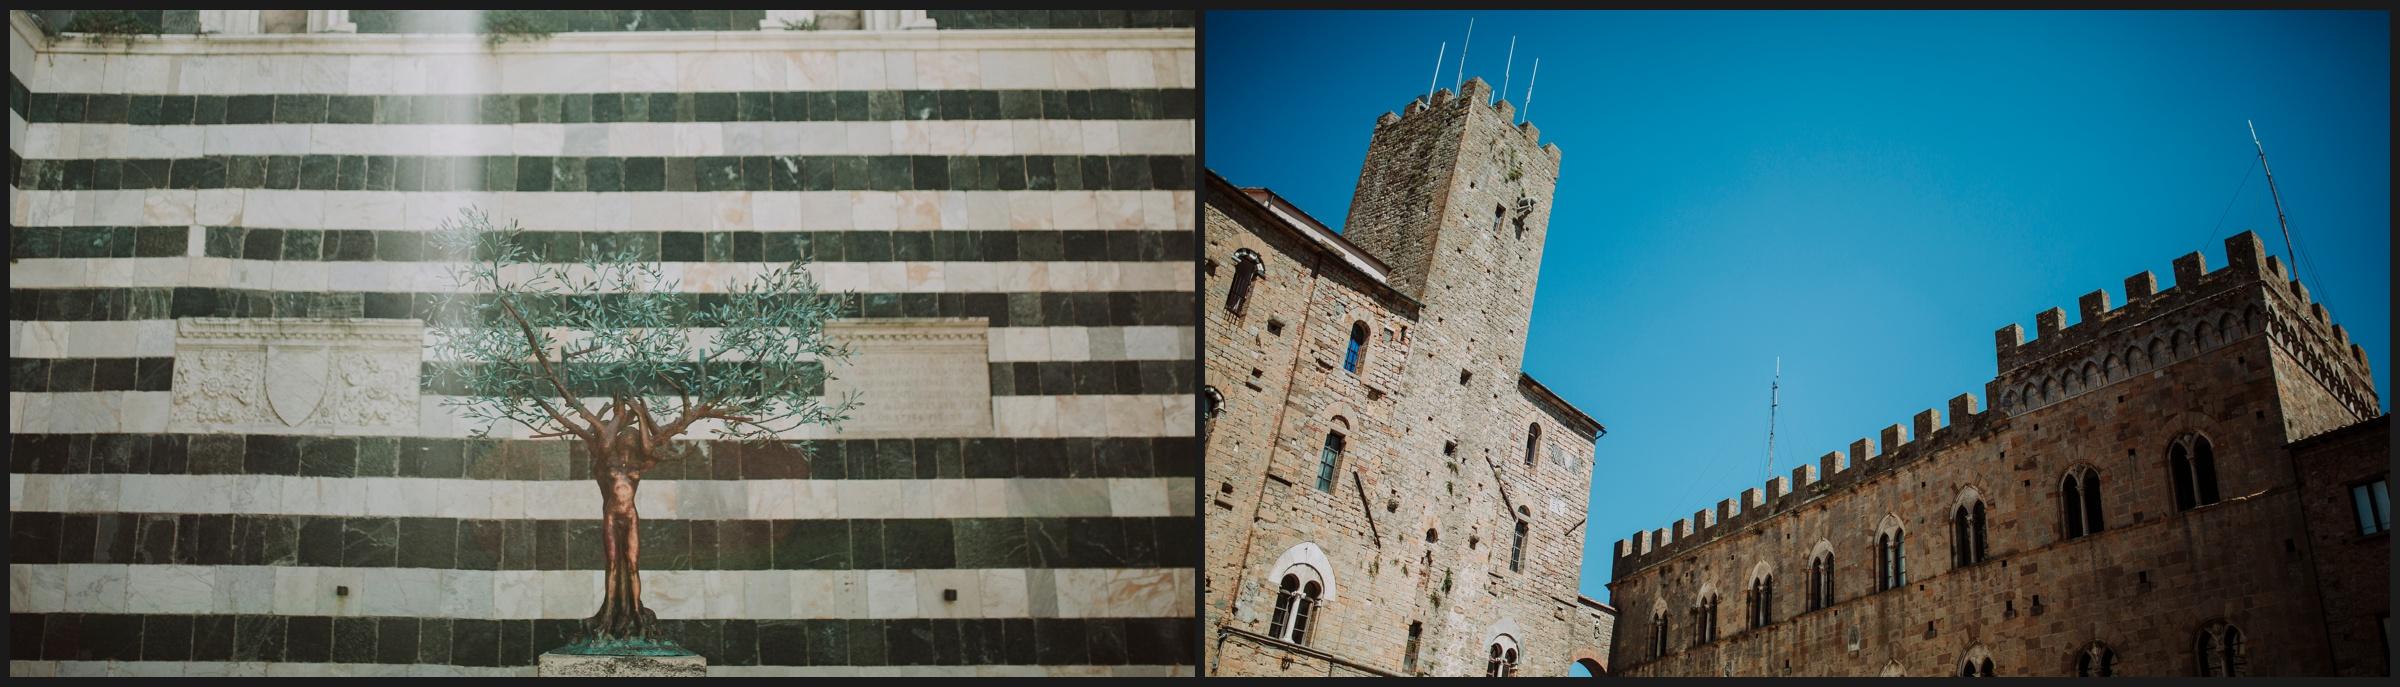 City of Volterra